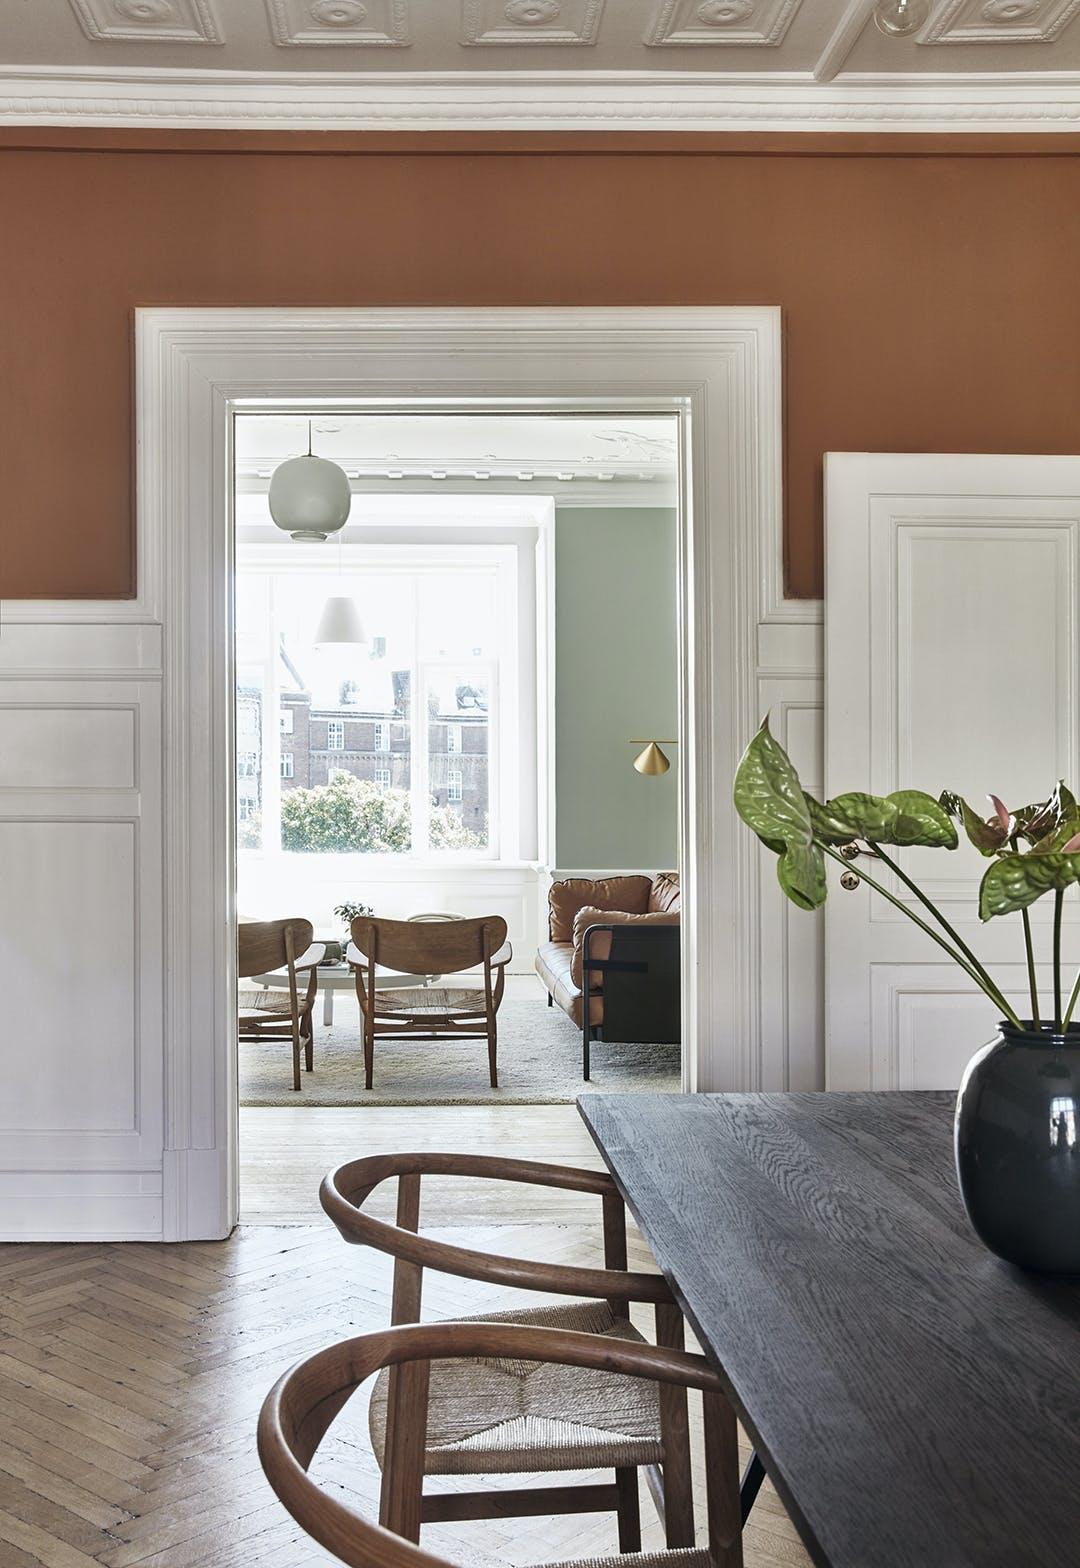 Spisebord spirsbordsstole vase